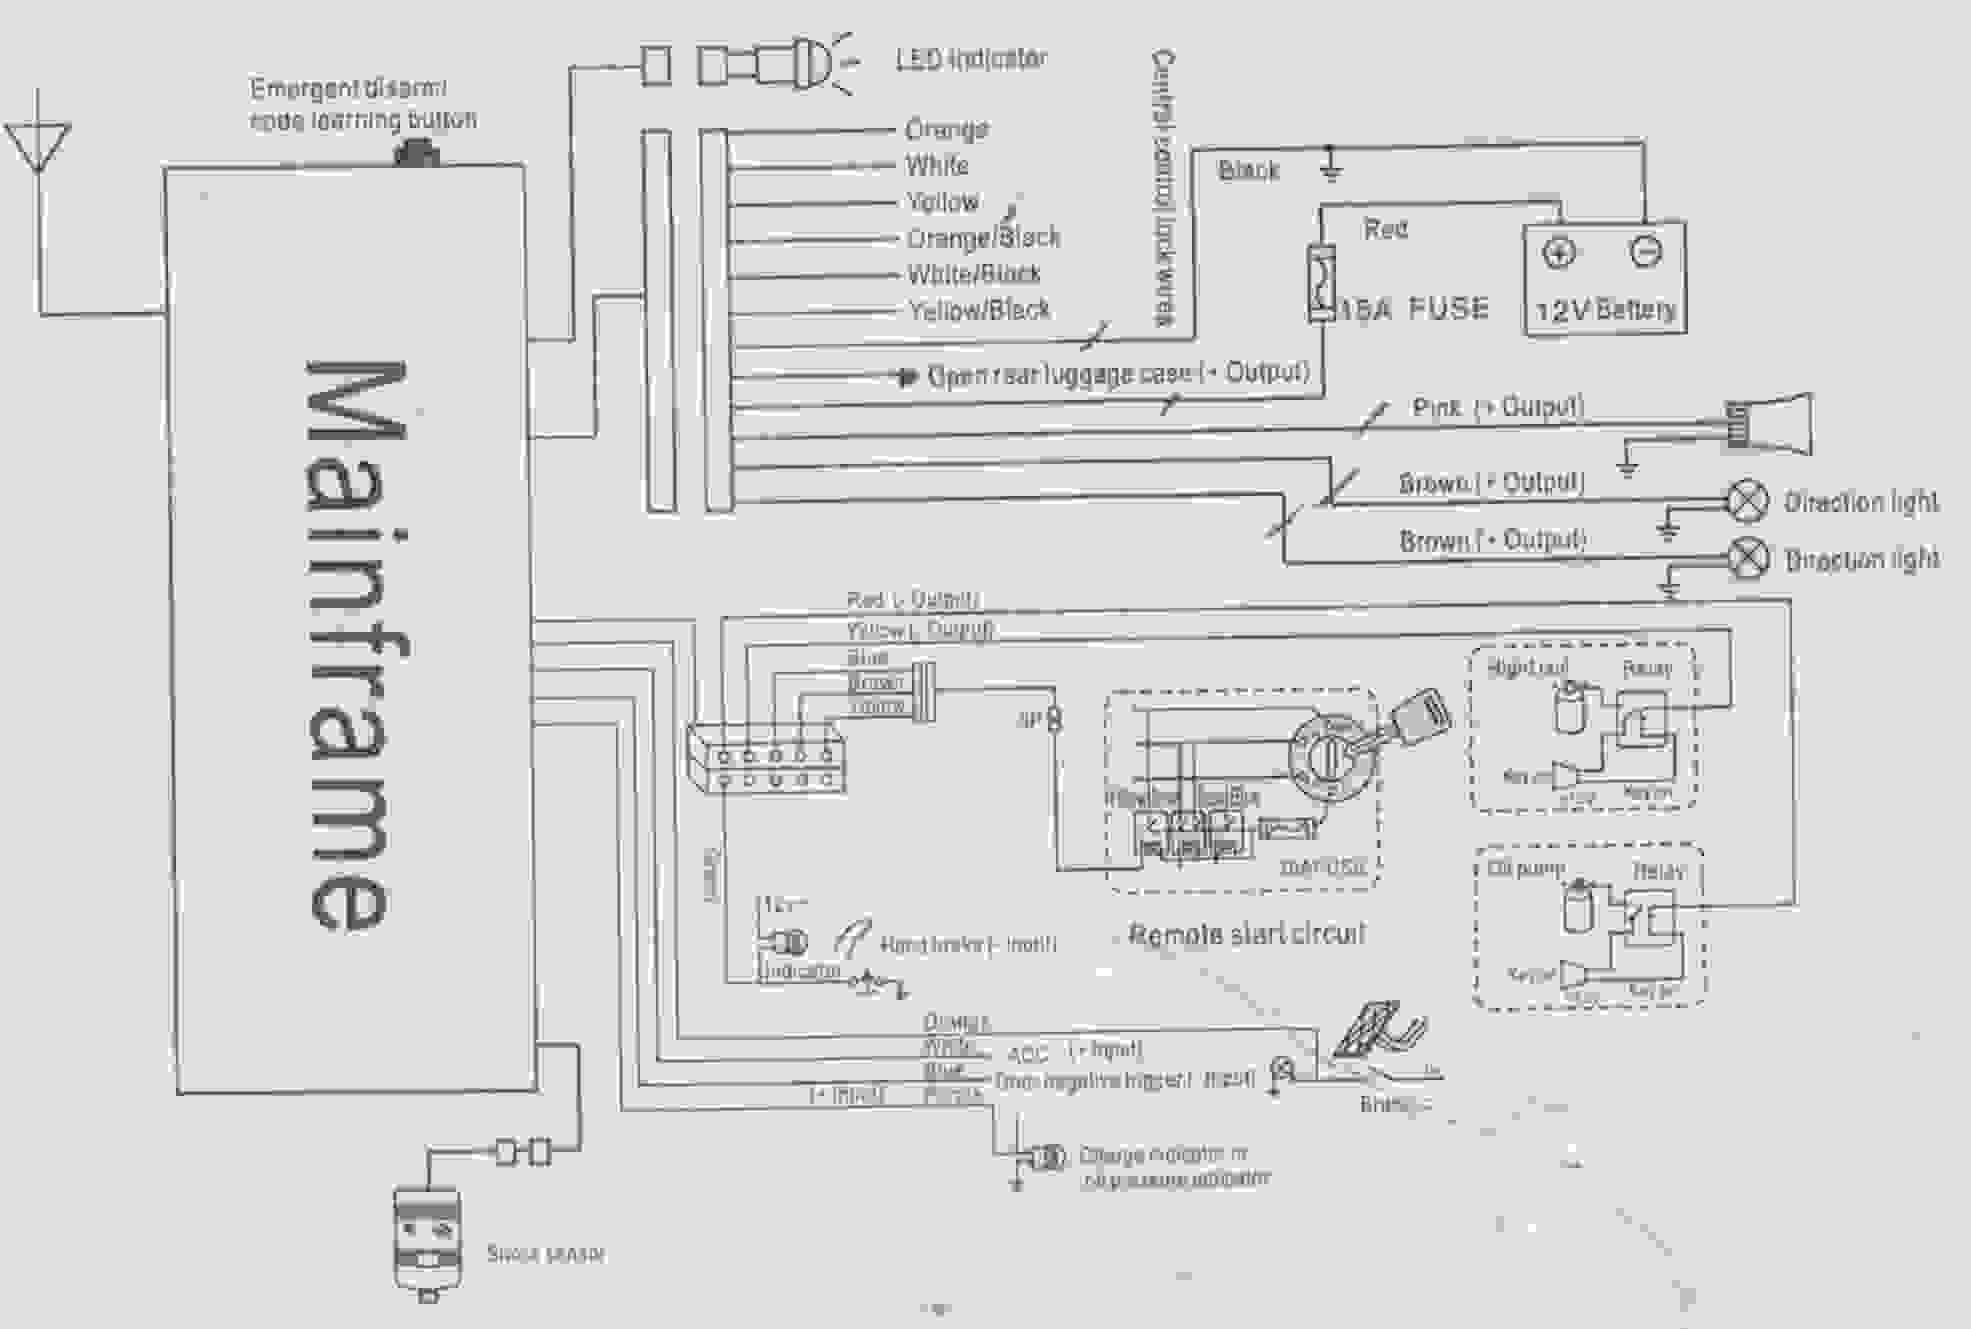 wiring diagram of car alarm system 1997 honda civic ex fuse box aolin